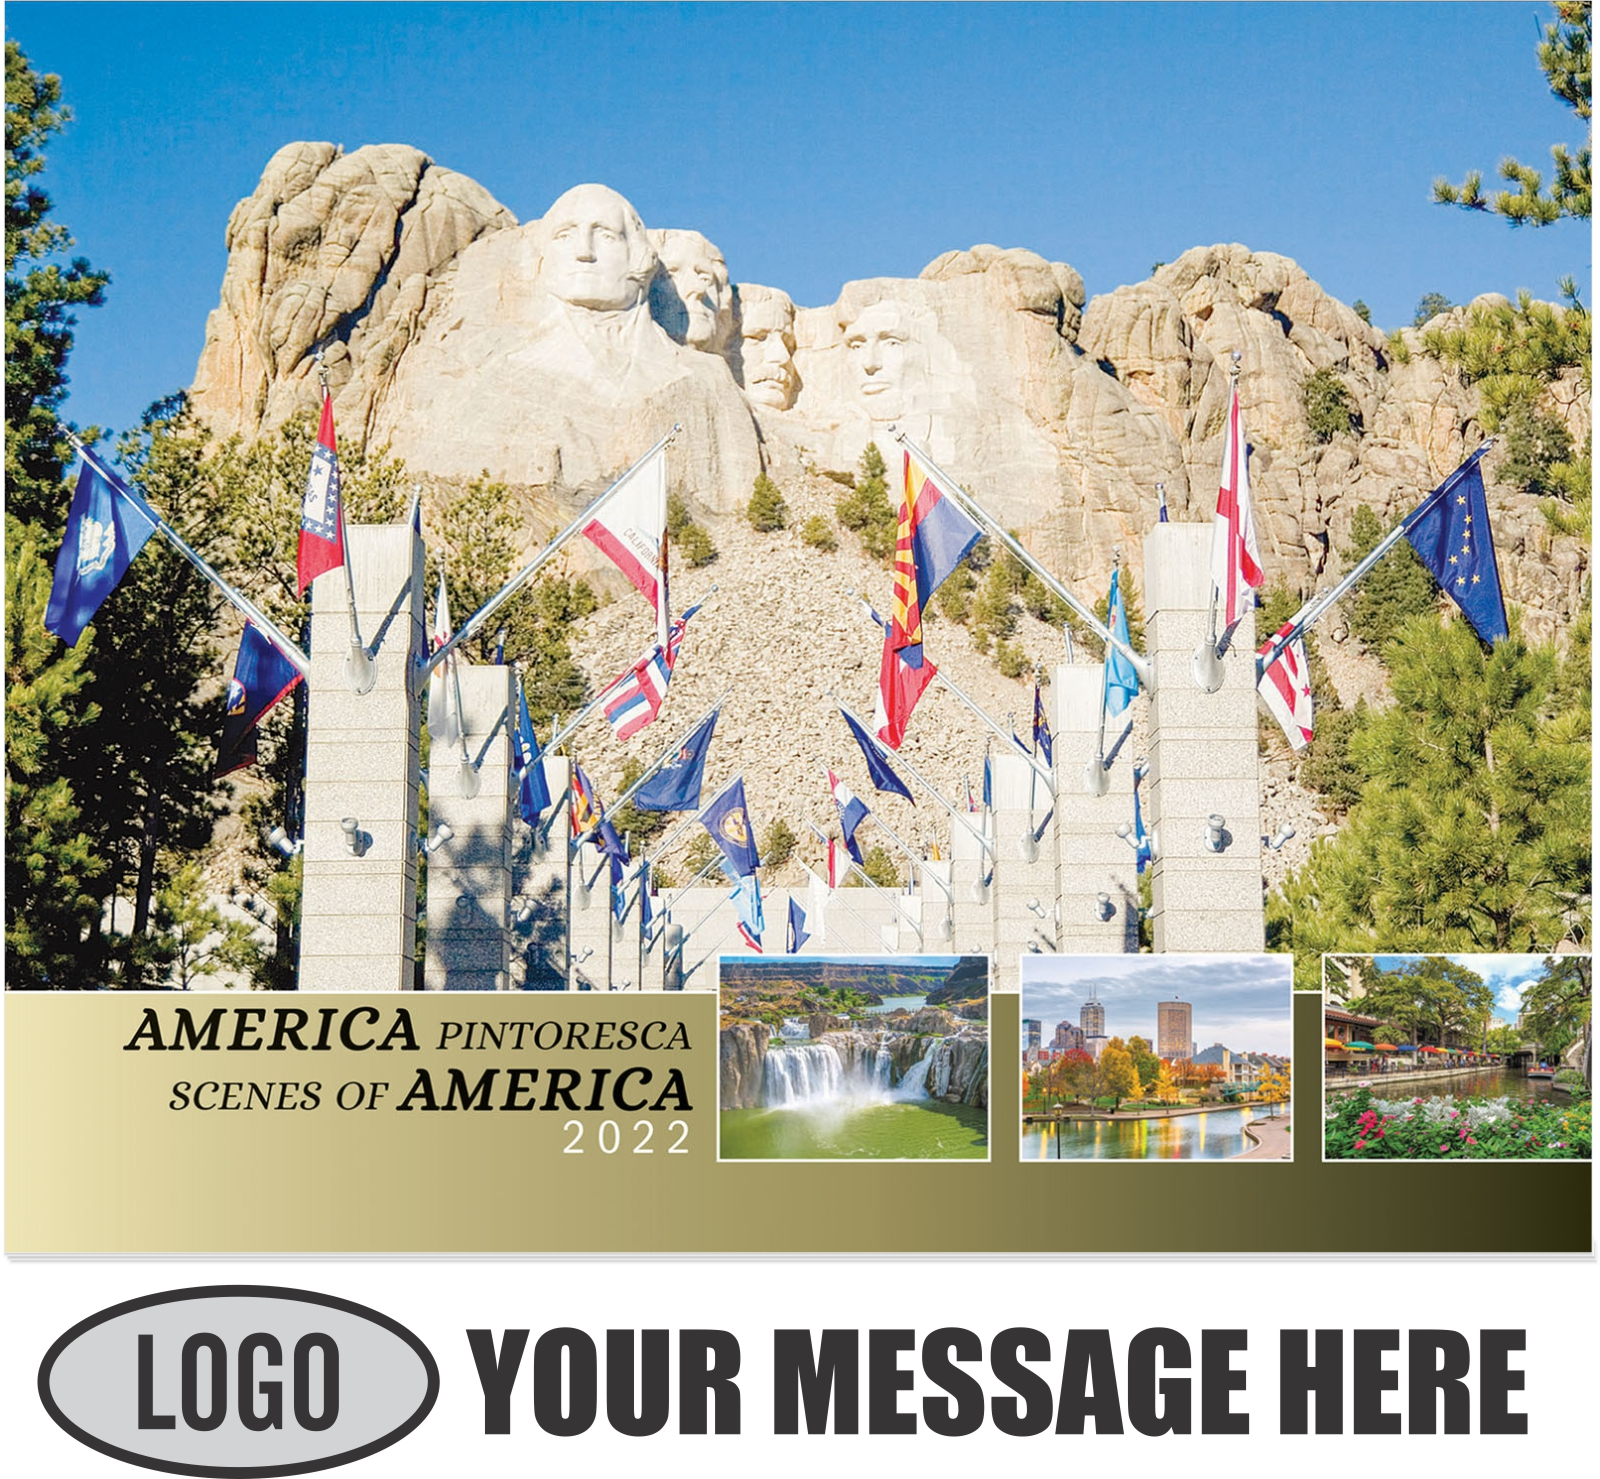 2022 Scenes of America (Spanish-English bilingual) Promotional Calendar